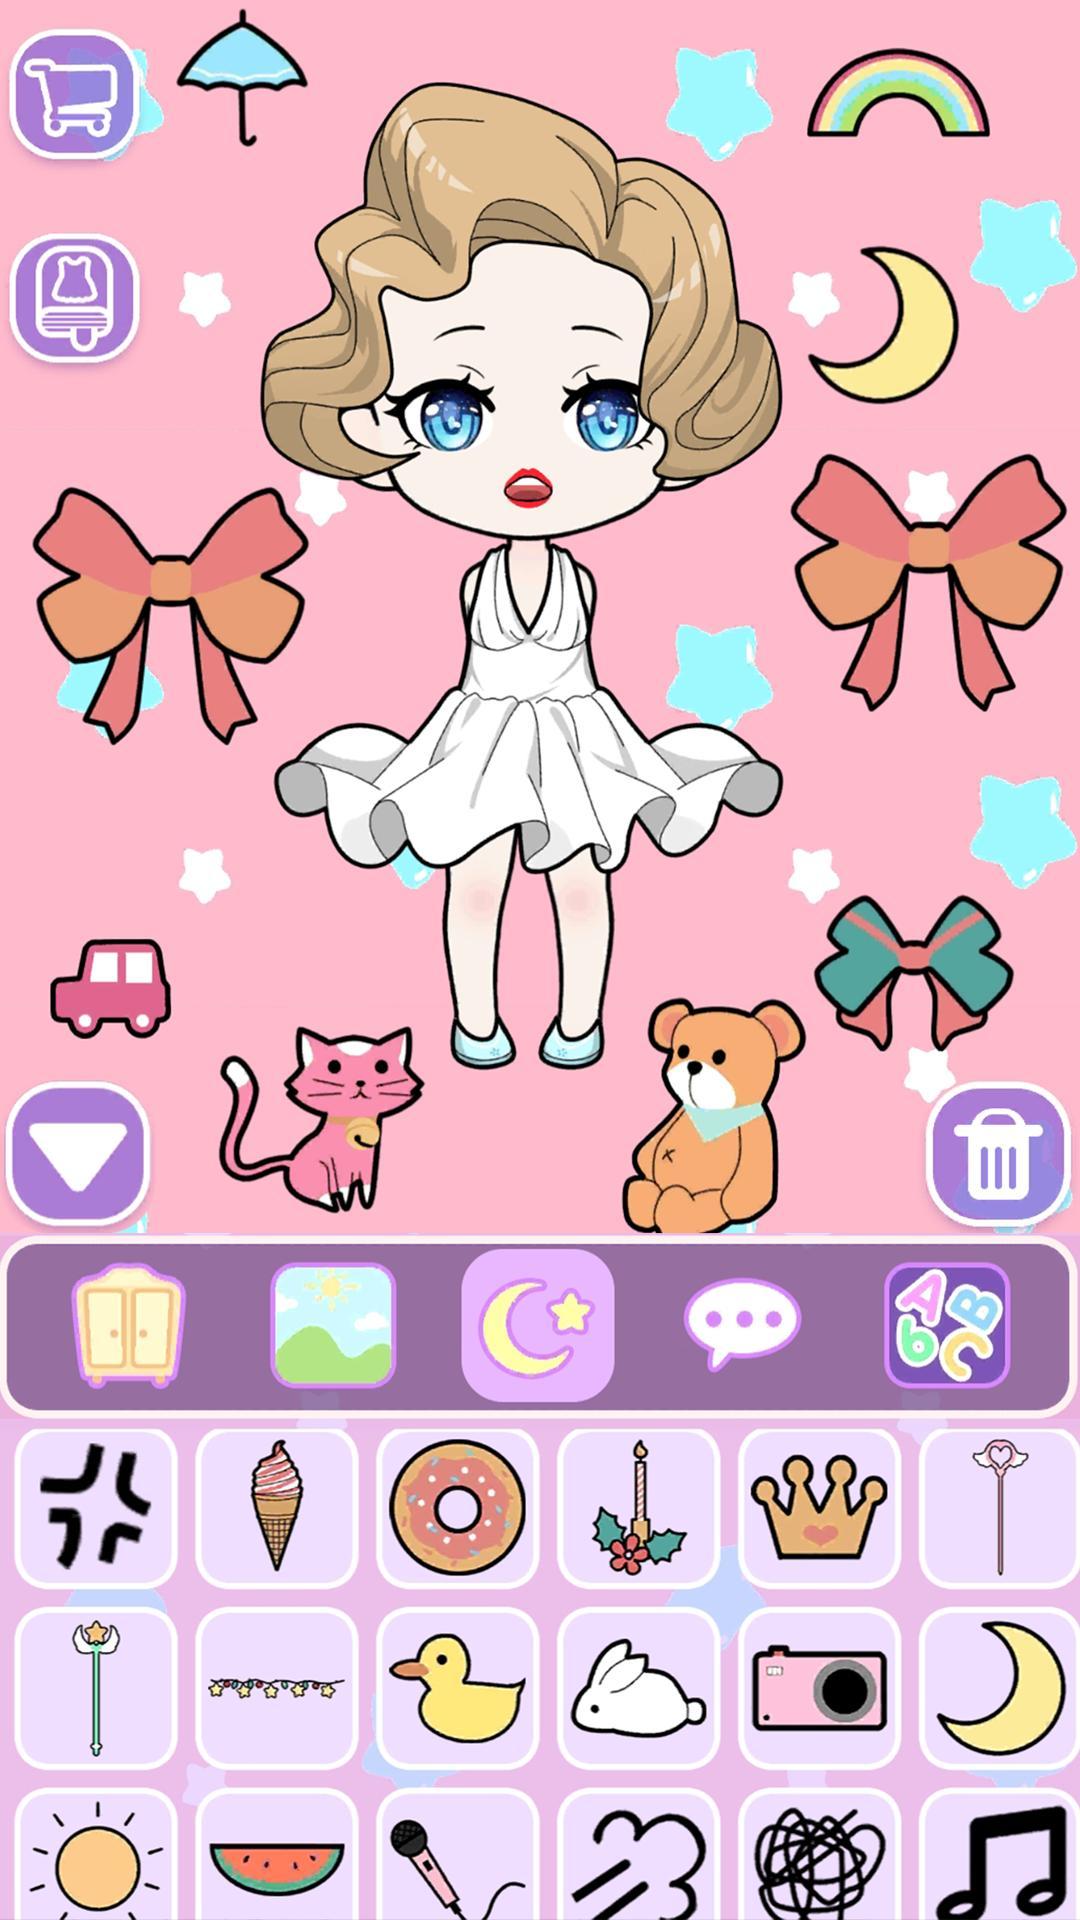 Vlinder Doll Dress up Games , Avatar Creator 1.2.1 Screenshot 6